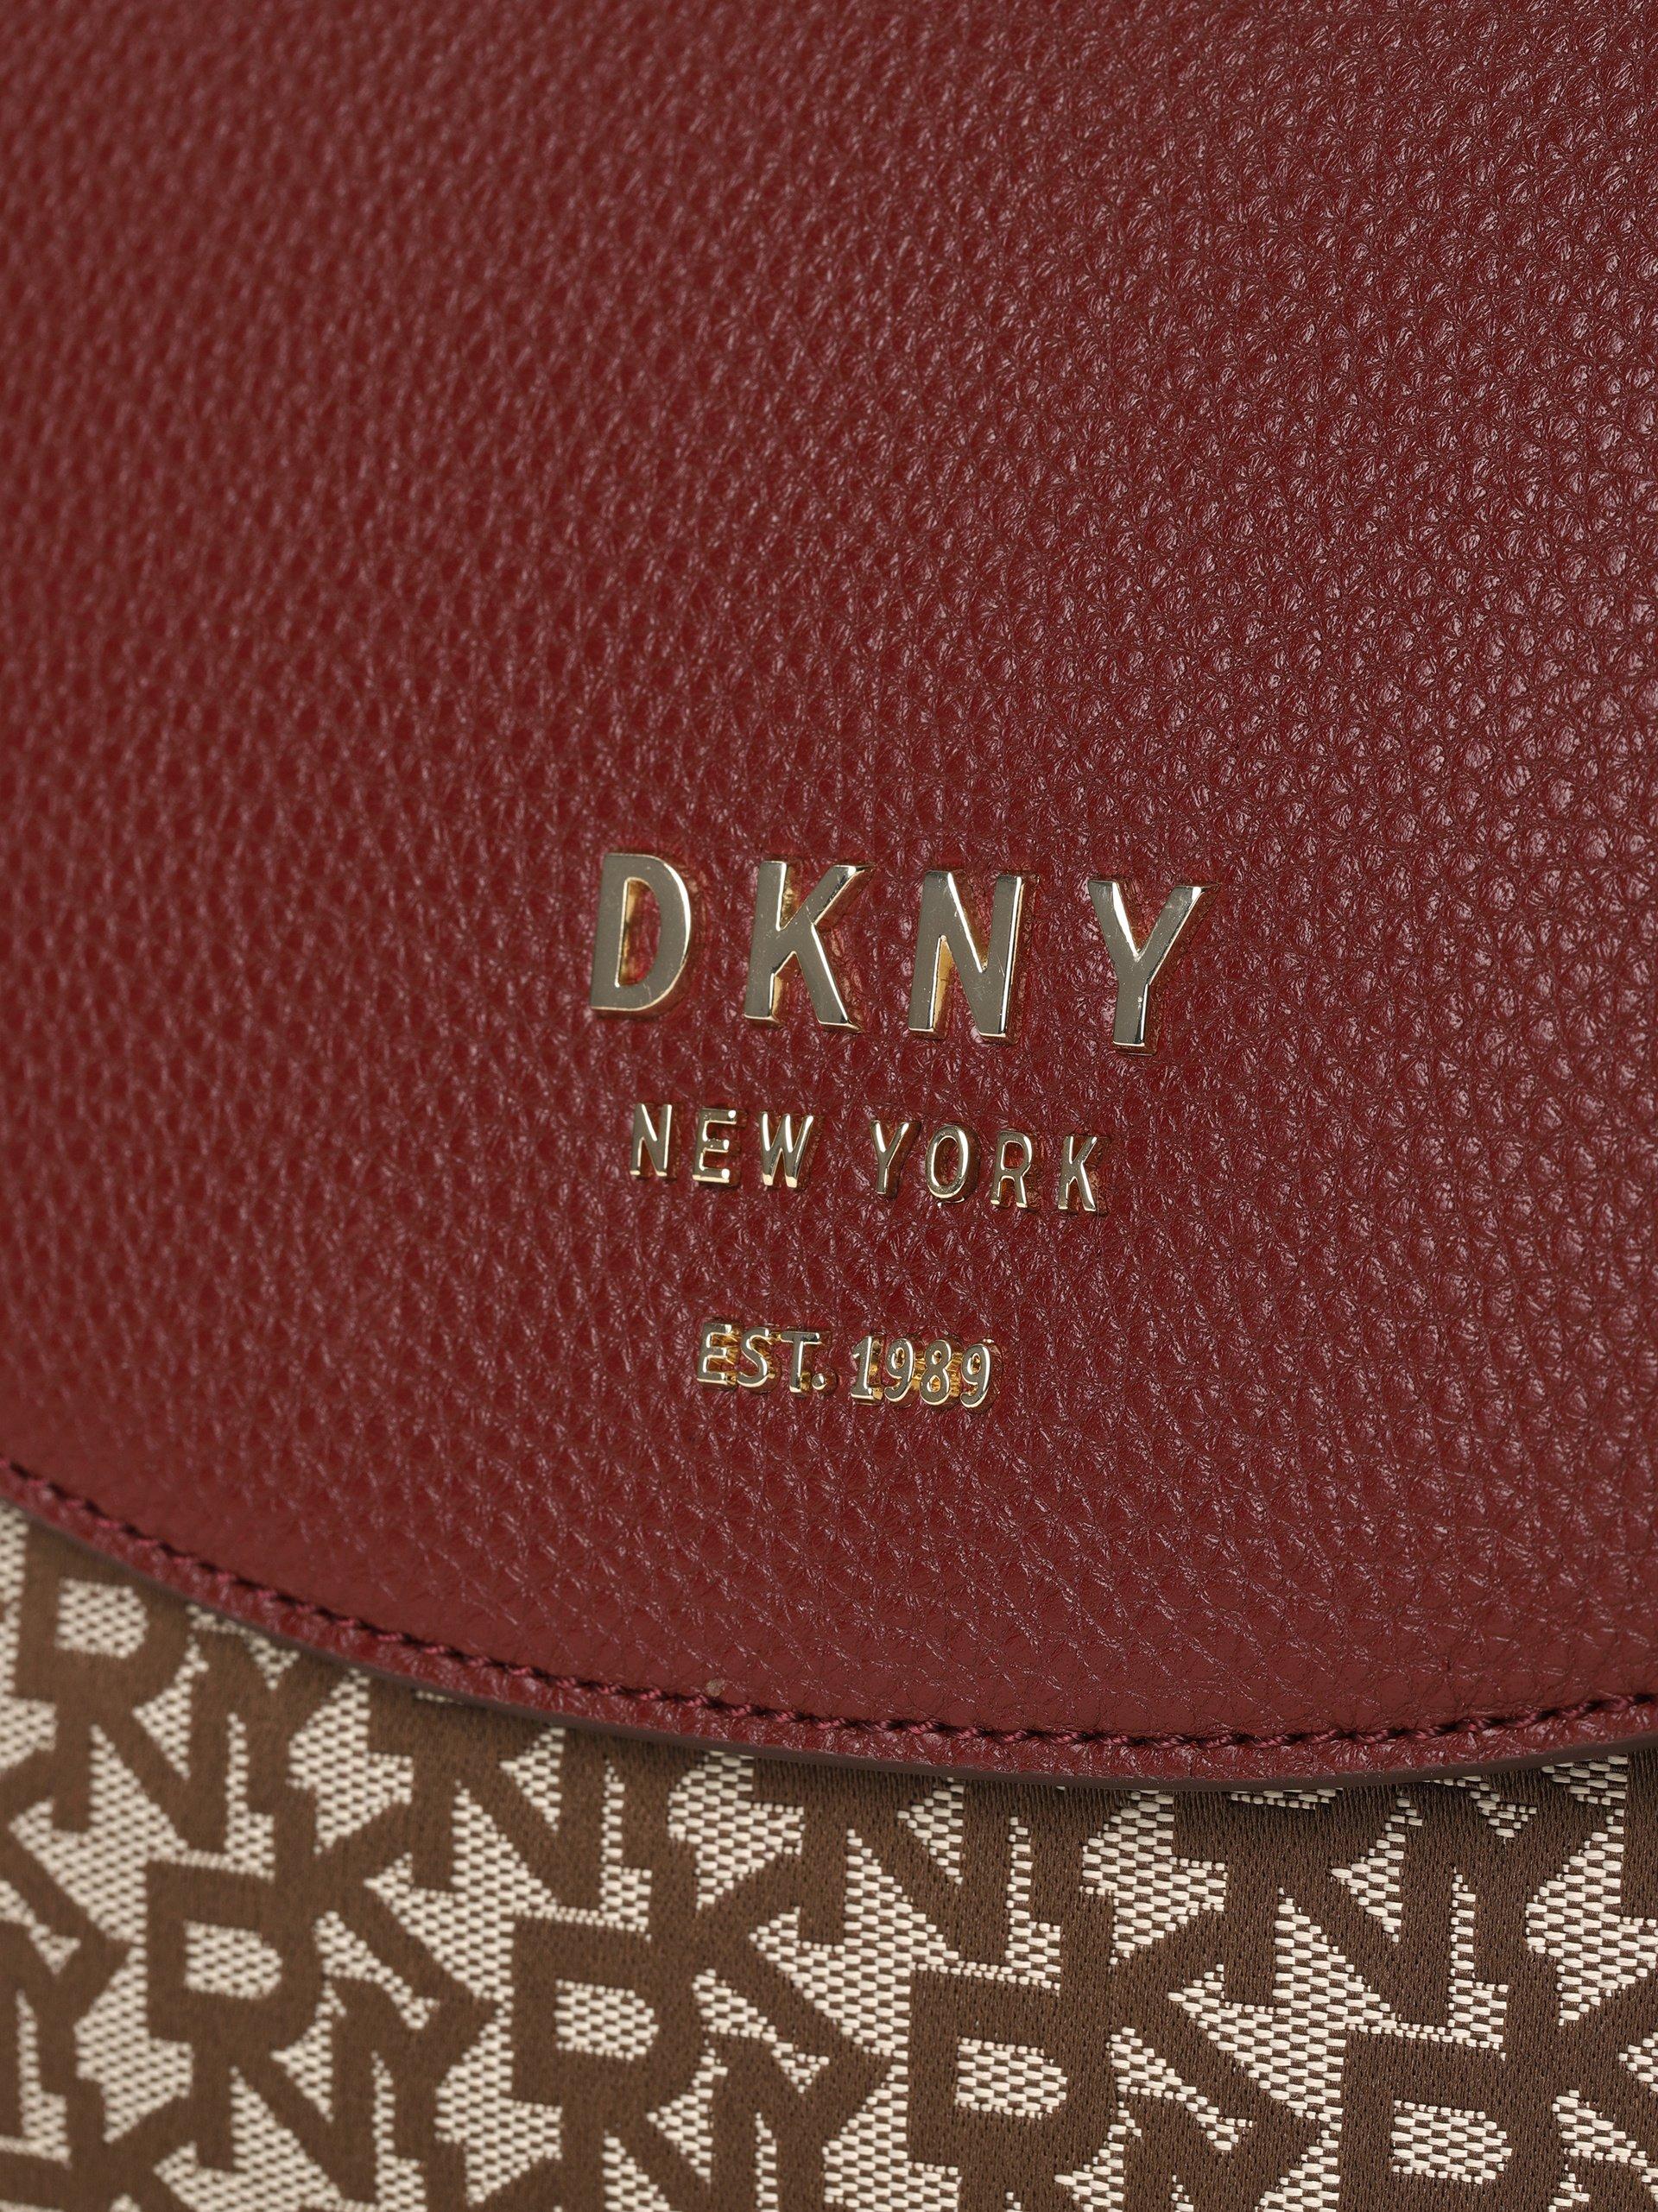 DKNY Damen Umhängetasche - Noho